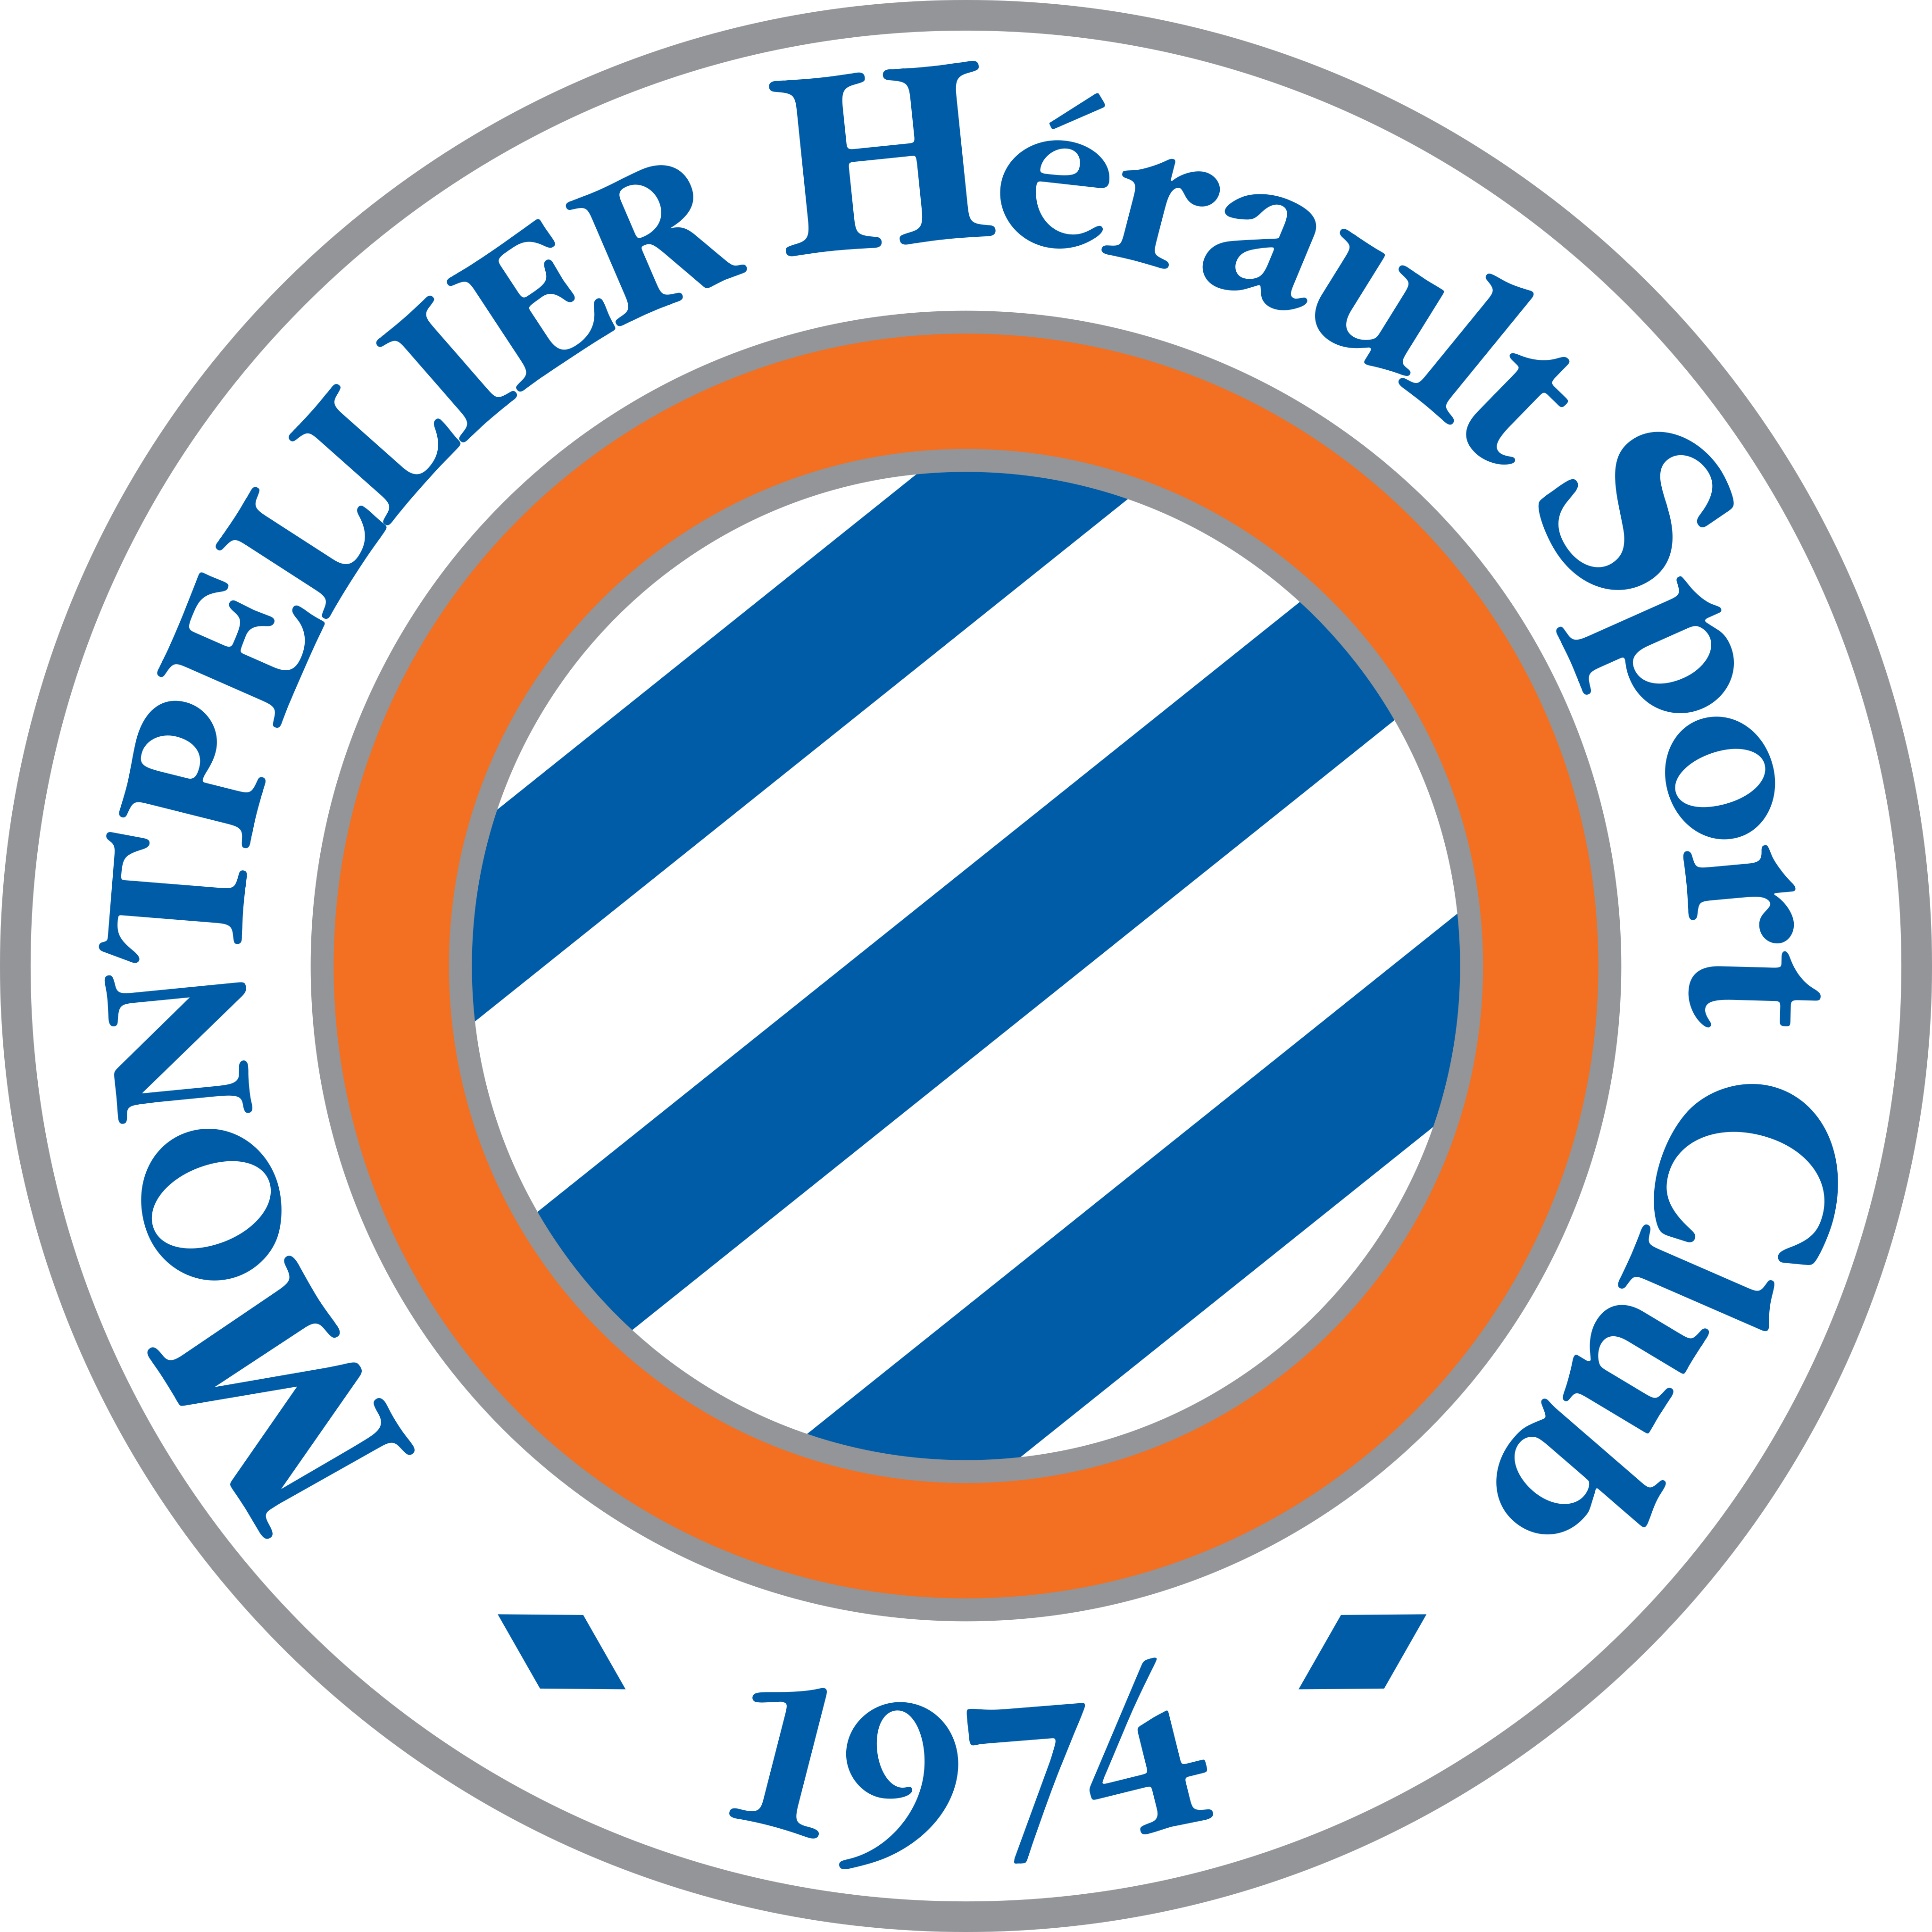 montpellier logo - Montpellier Logo - Montpellier Hérault Sport Club